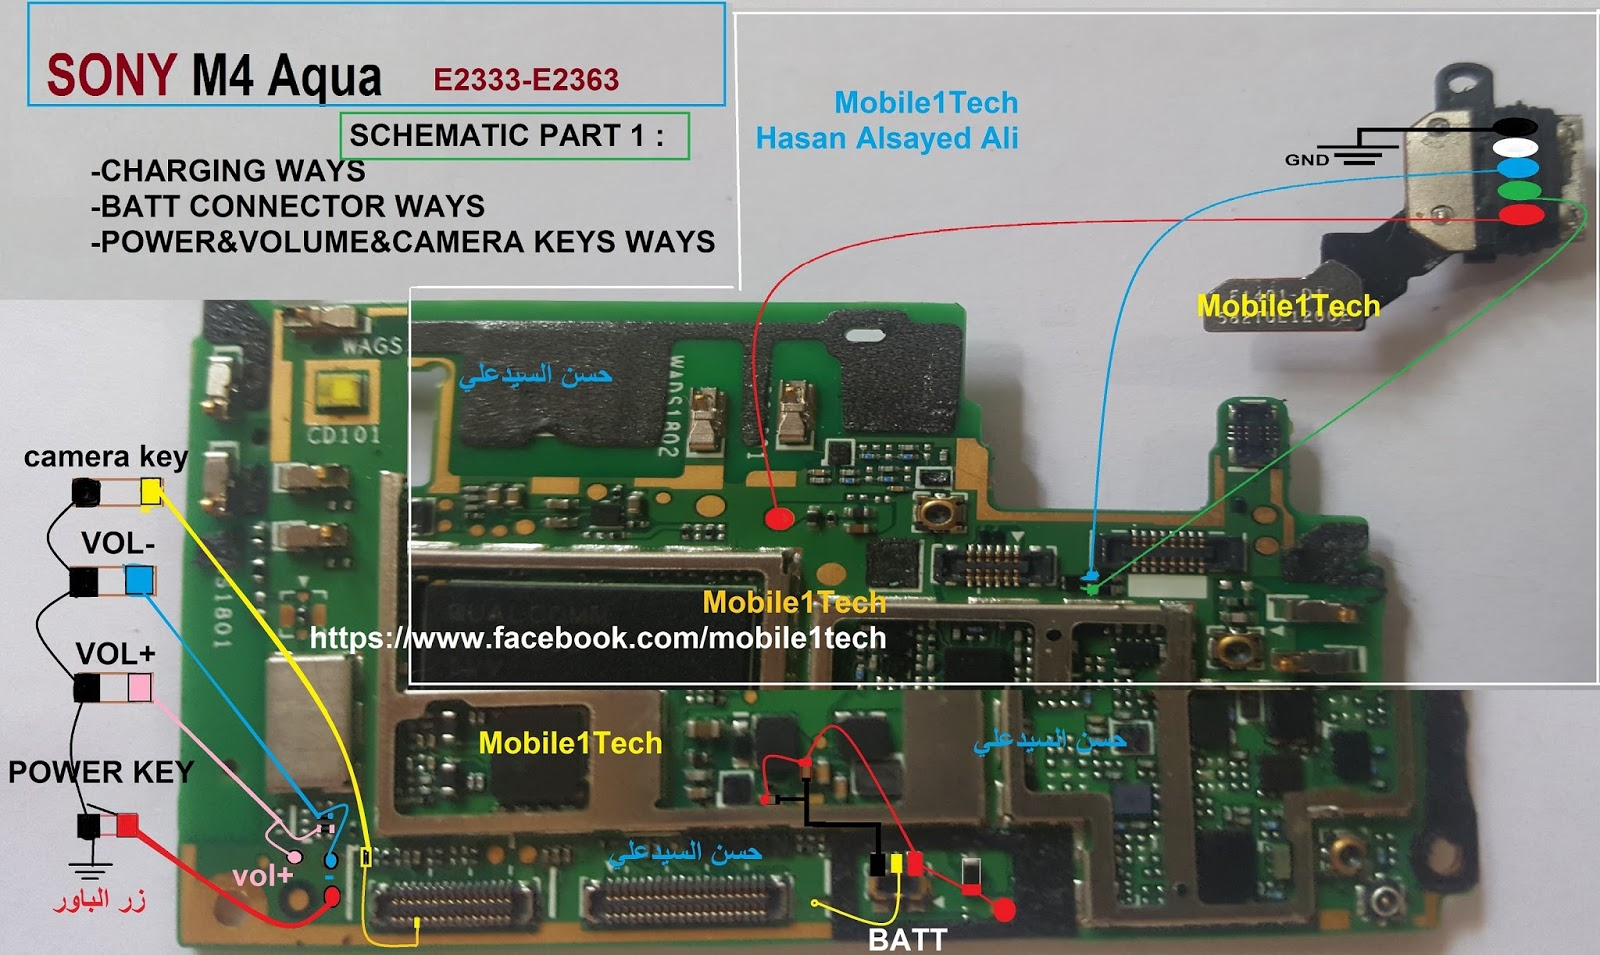 sony m4 aqua full schematic mobile1tech m16a2 schematic sony m4 aqua e2333 e2363 schematic part1 sony m4 e2333 e2363 charging ways sony m4 e2333 2363 battery ways sony m4 e2333 e2363 power key ways